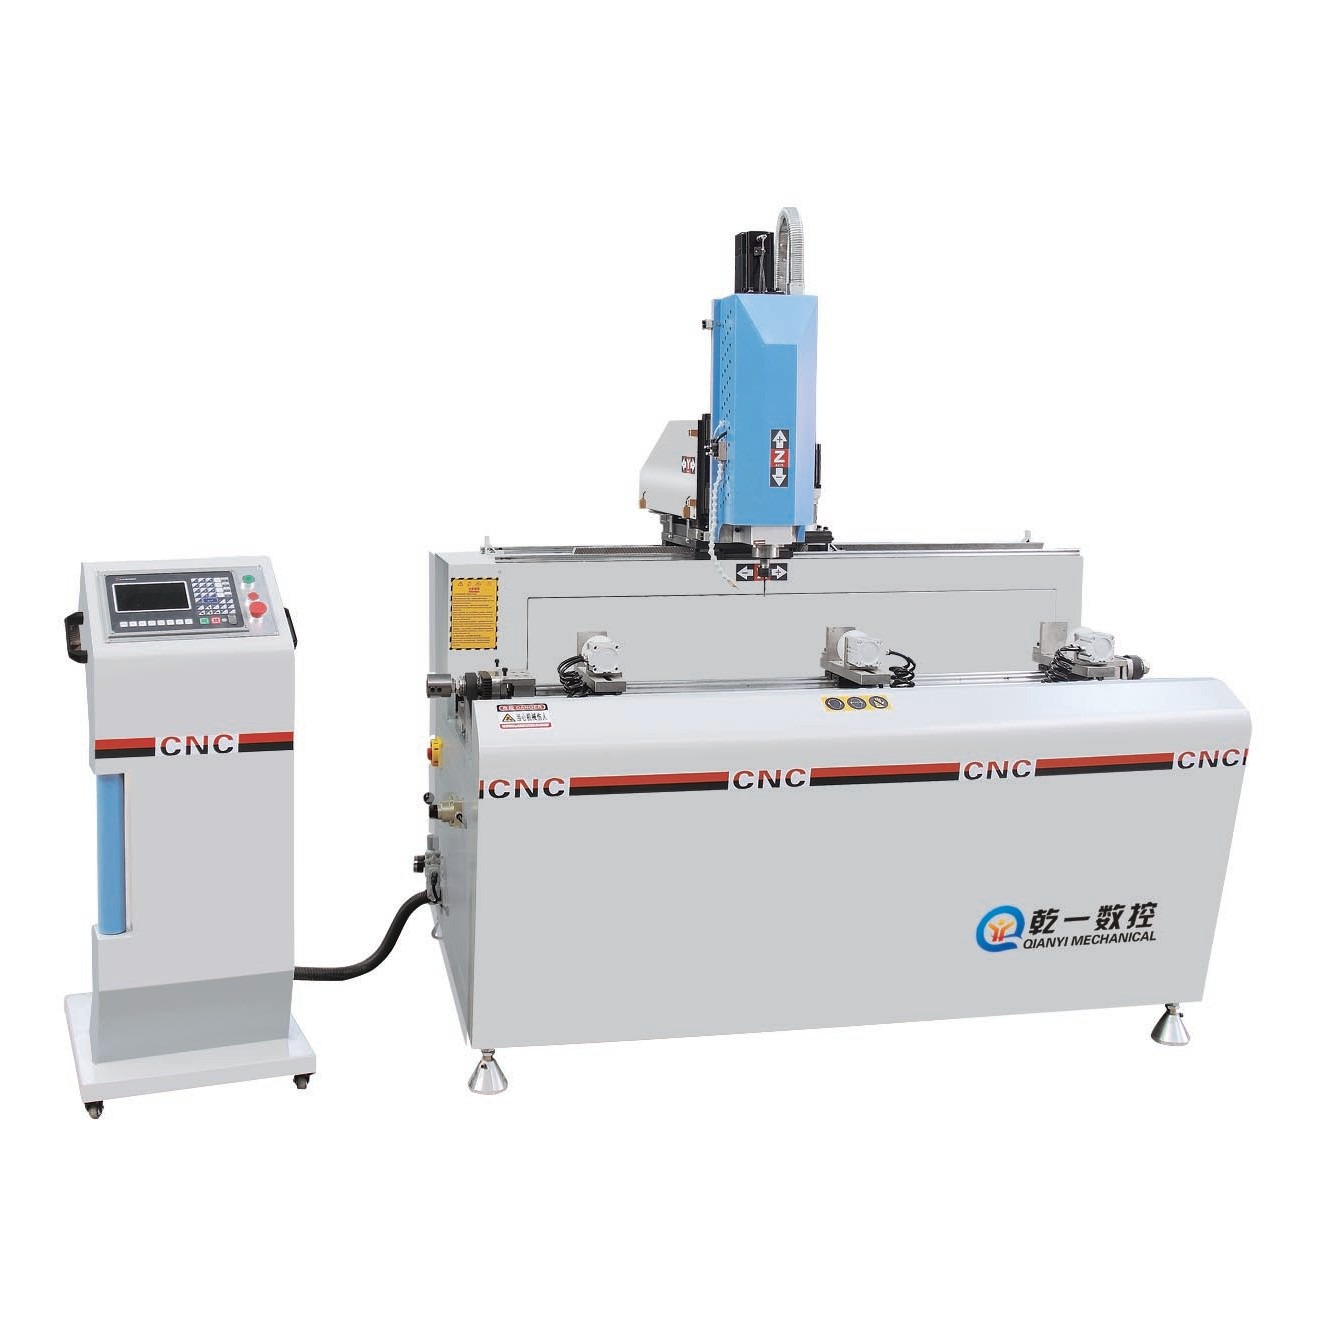 SKX3+1-CNC-1200 铝型材3+1轴数控钻铣床(伺服步进可定制)